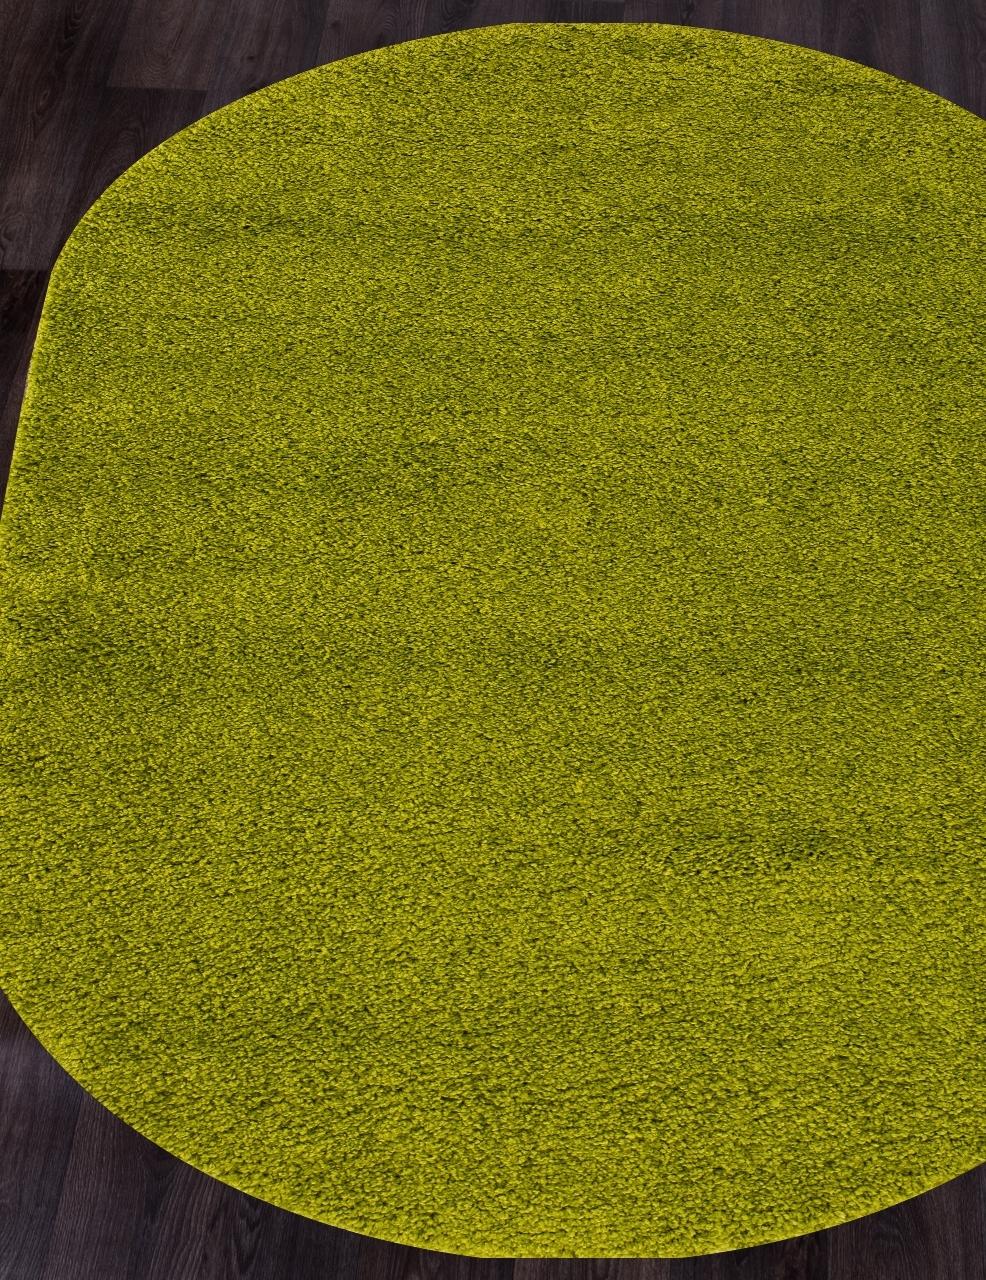 Ковер s600 - GREEN - Овал - коллекция SHAGGY ULTRA